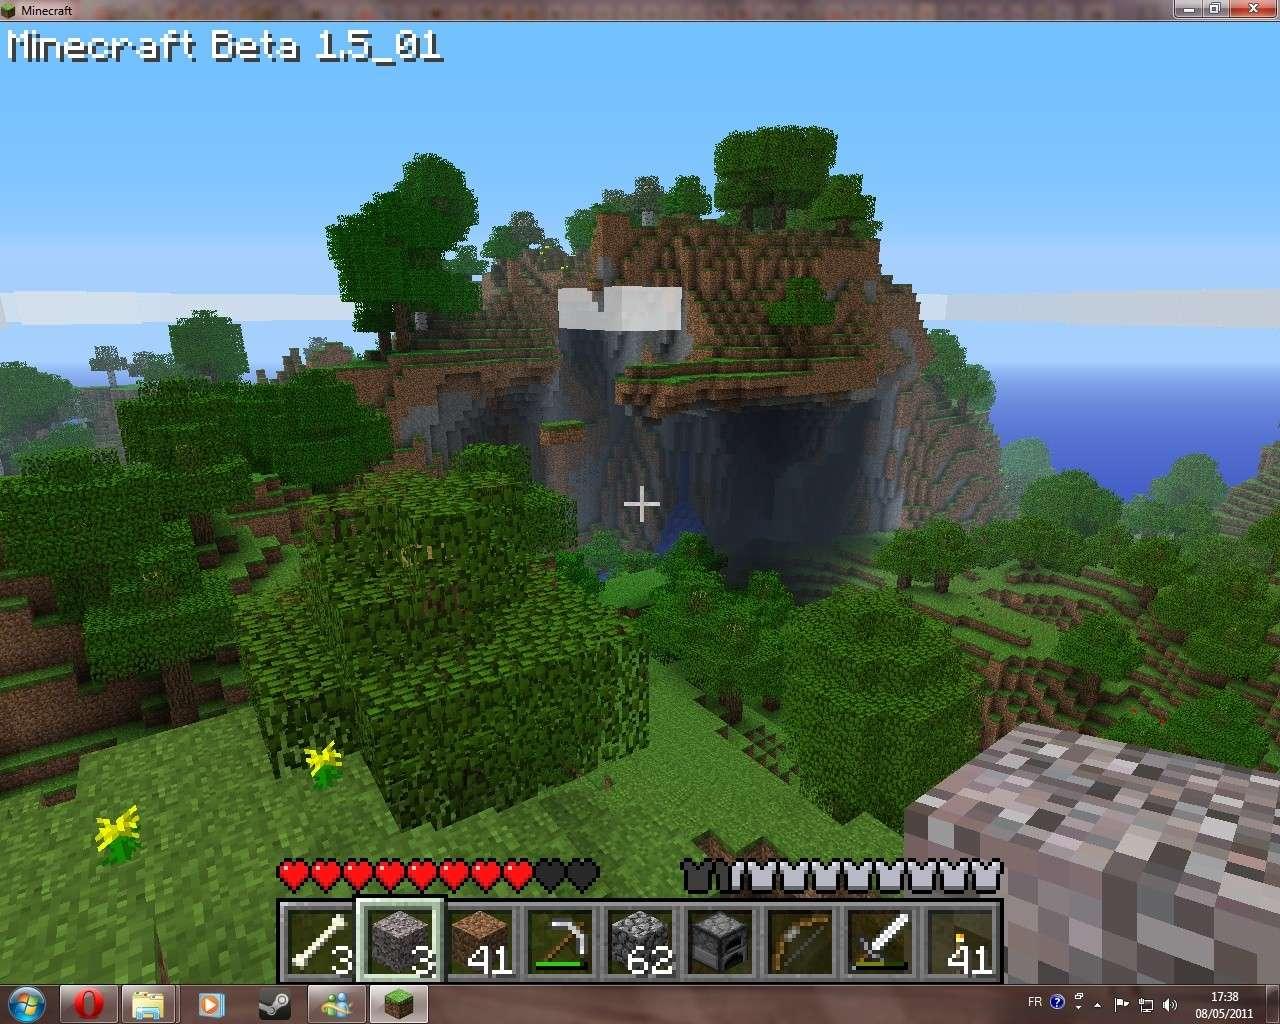 [Minecraft] Mon chez moi (moi moi chez moi moi moiiiii) - Page 6 New_bi25